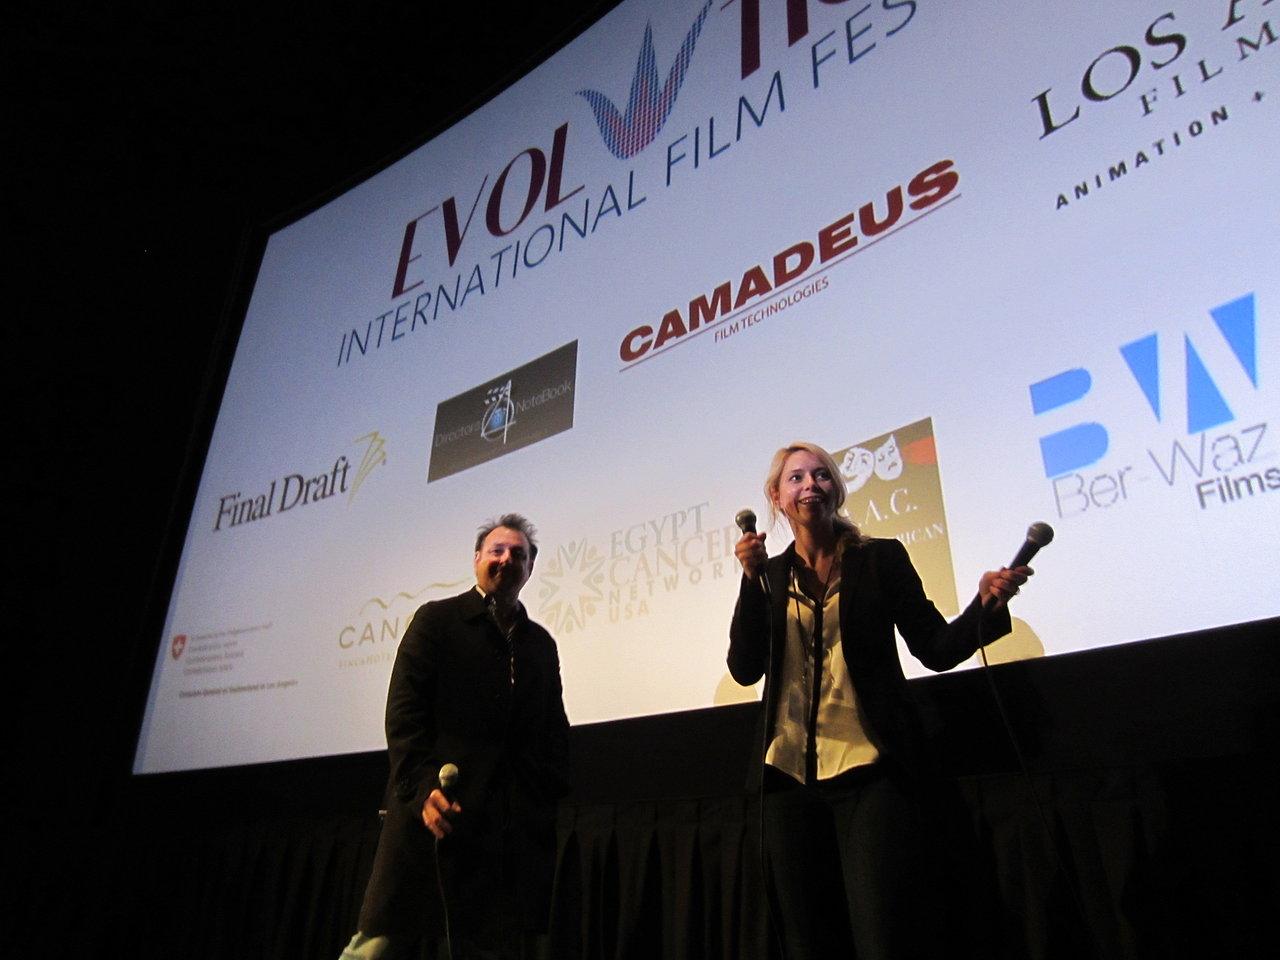 Diretor Richard Reens (left)